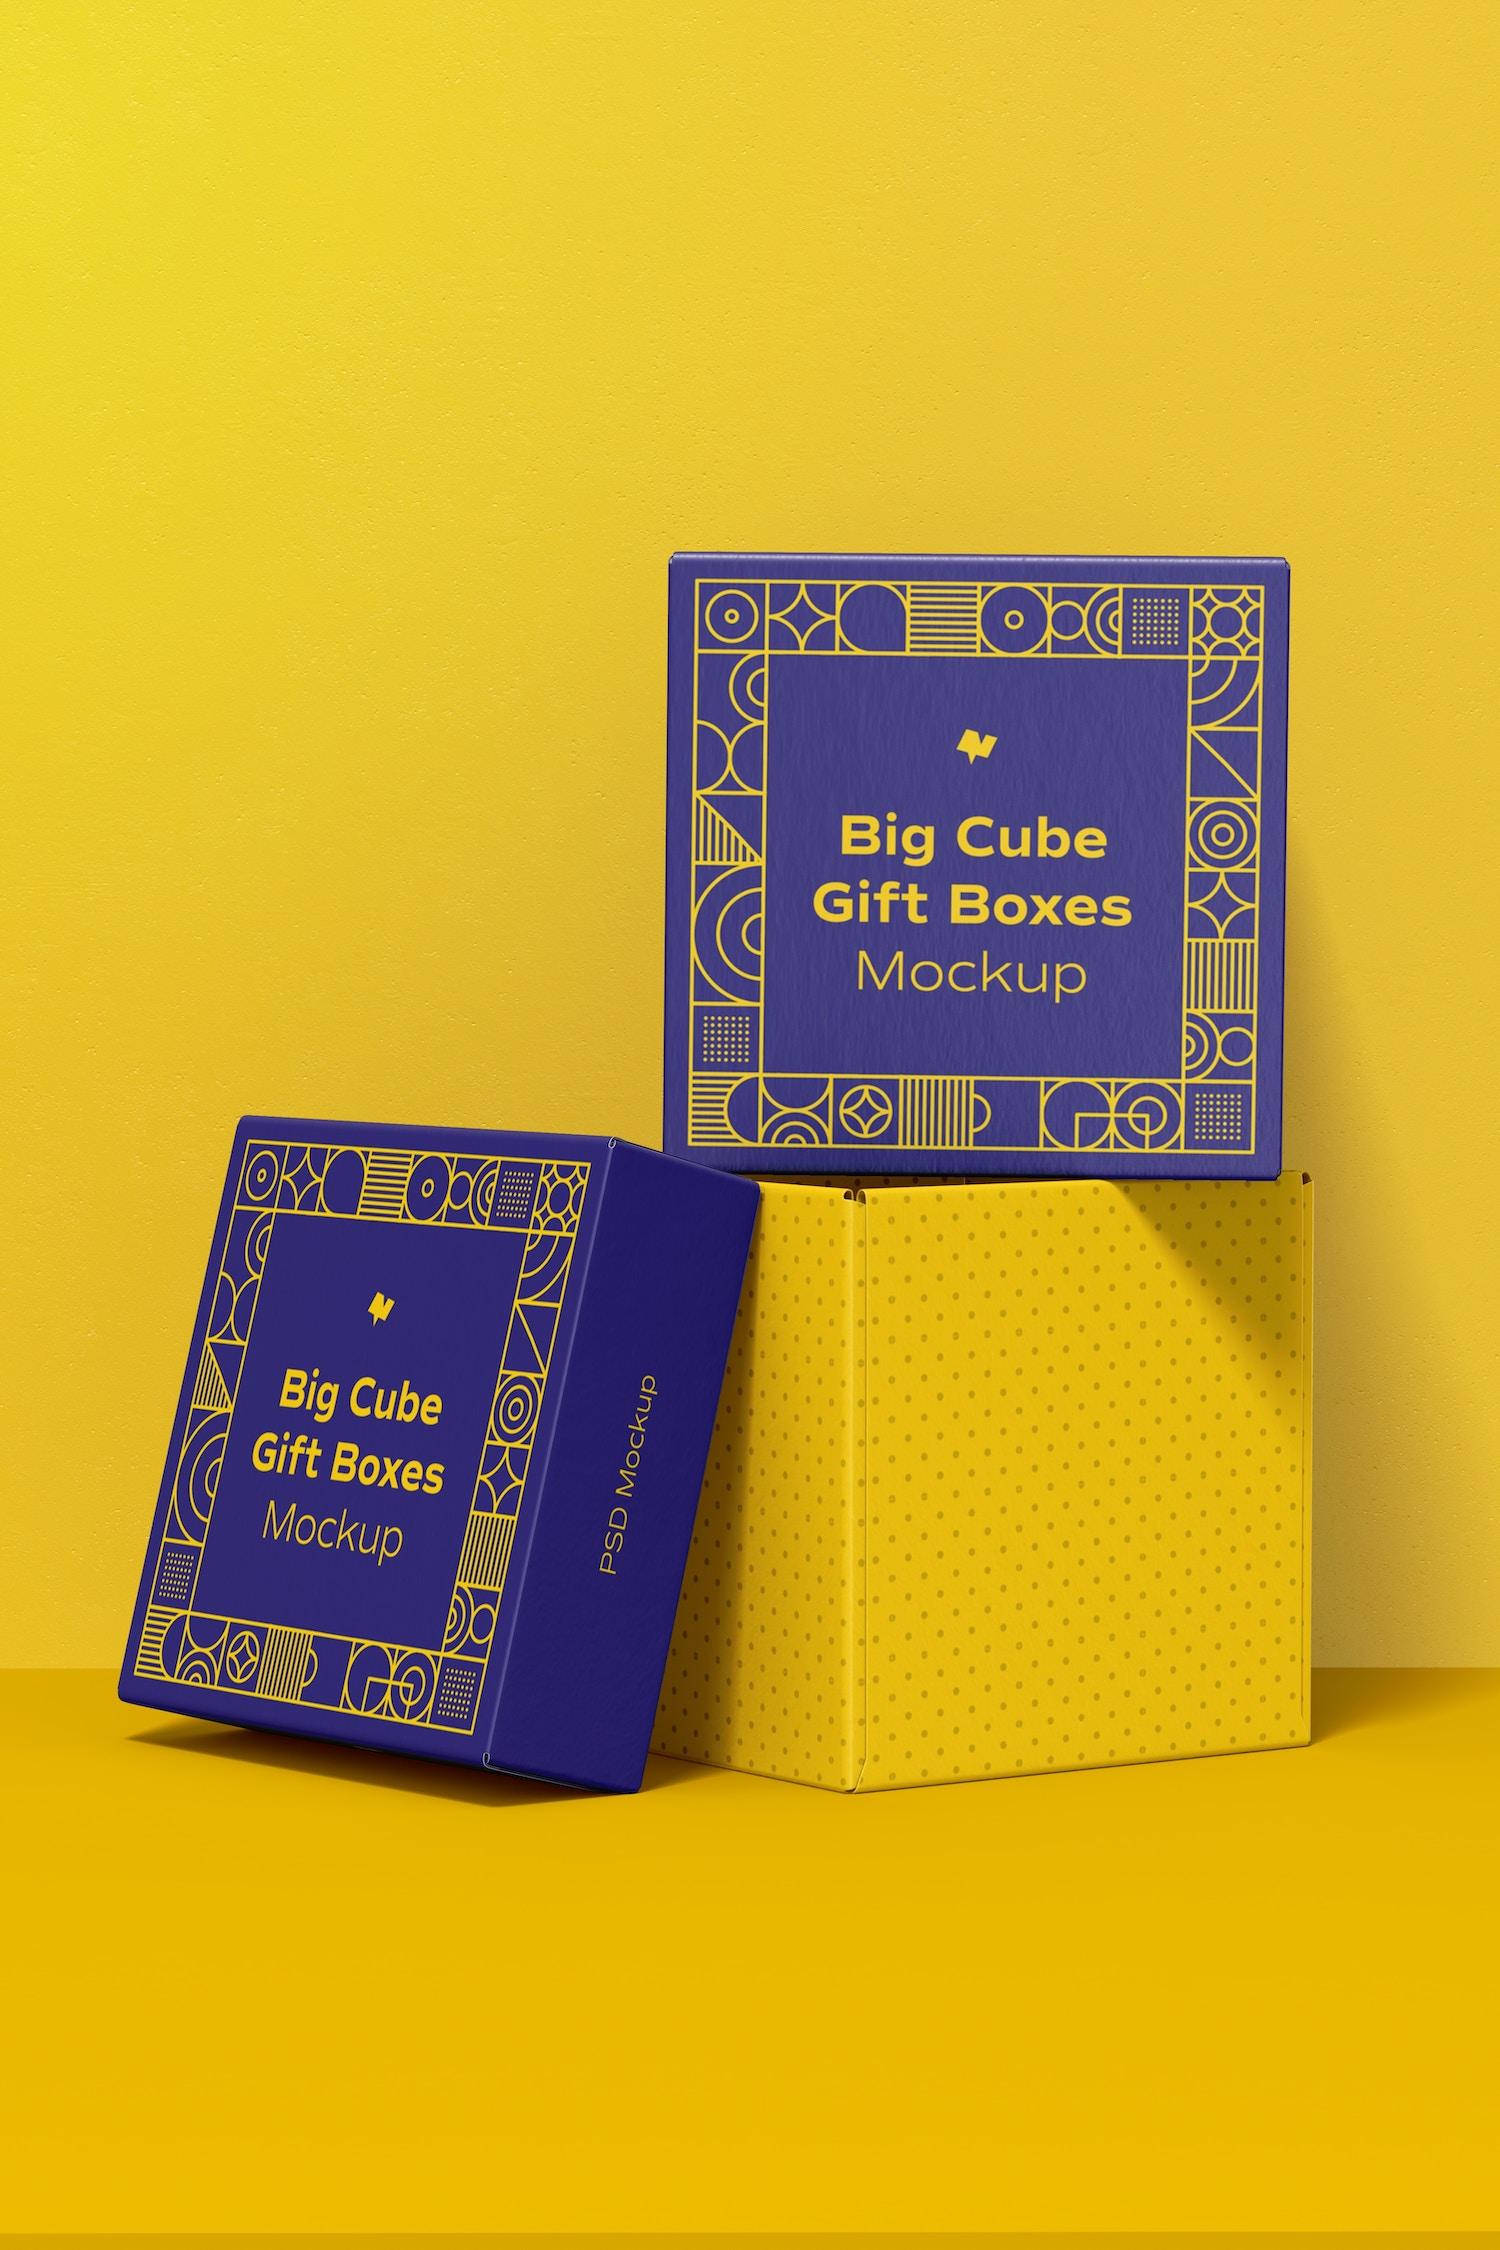 Big Cube Gift Boxes Mockup, Stacked